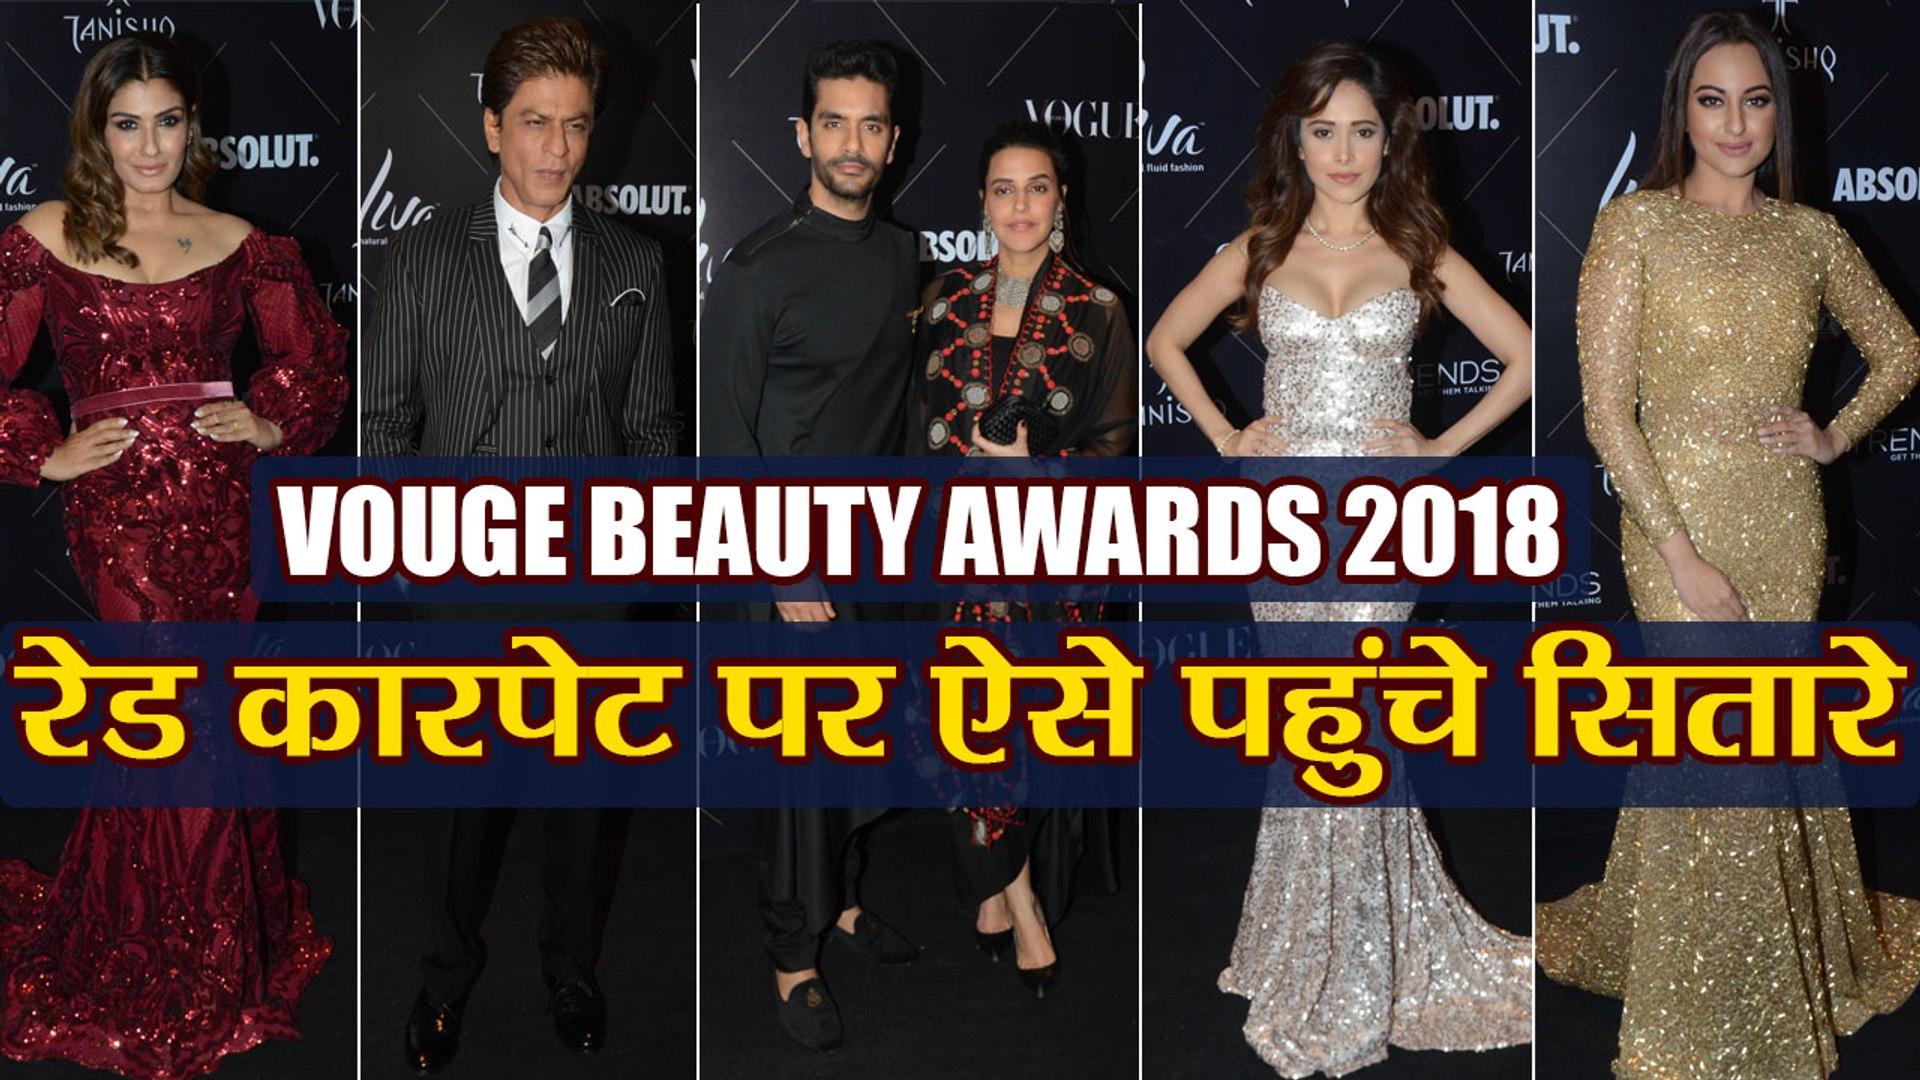 Vogue Beauty Awards 2018 Red Carpet UNCUT: Manushi, Dia समेत कई बॉलीवुड Celebs ने बिखेरे जलवे। Bolds